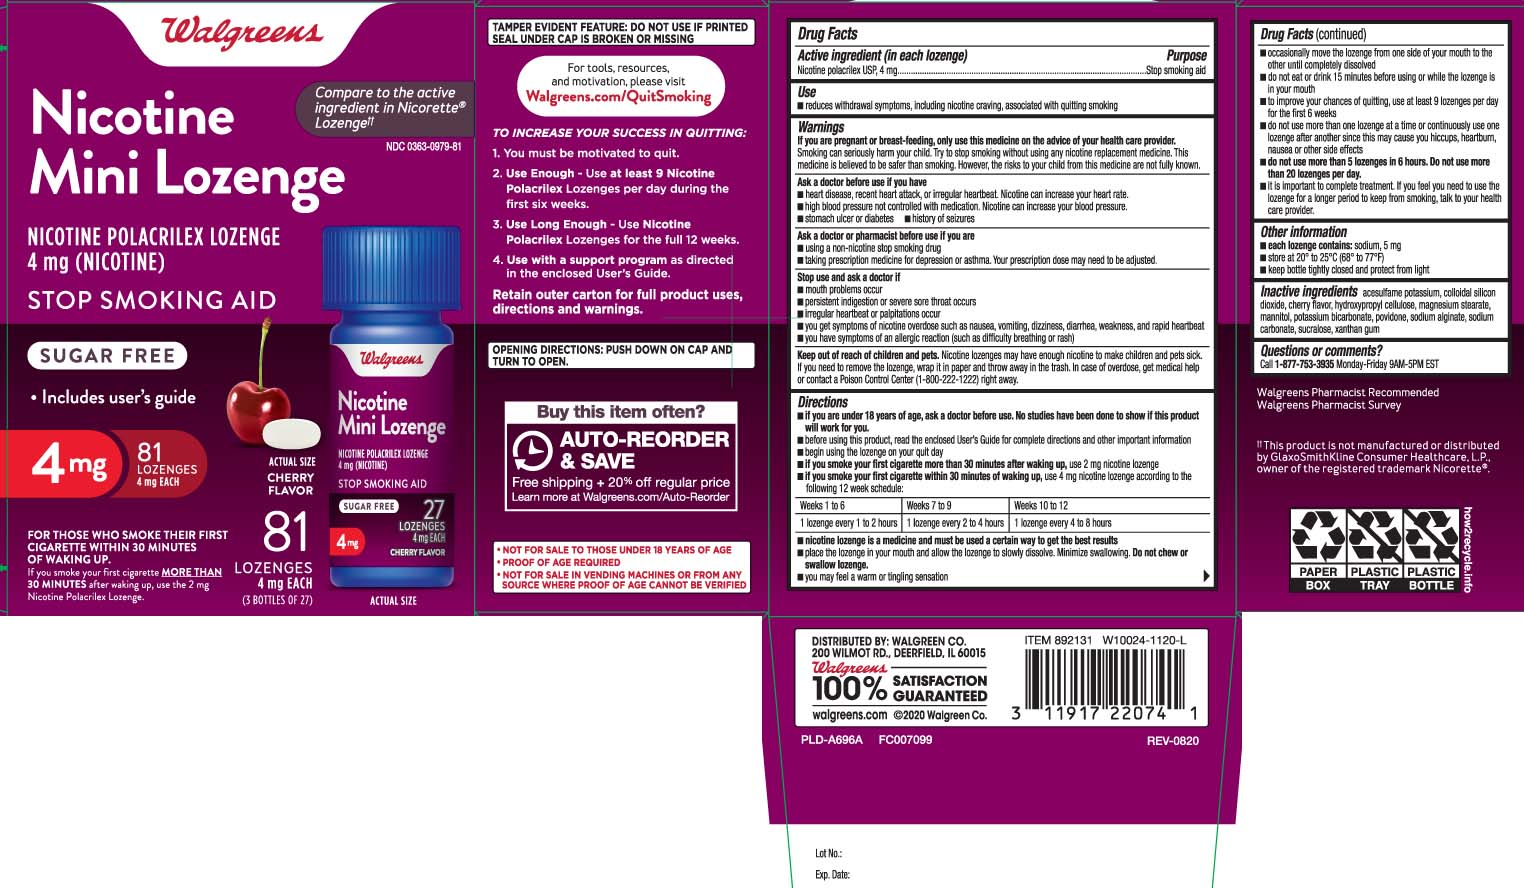 Nicotine Polacrilex USP 4 mg